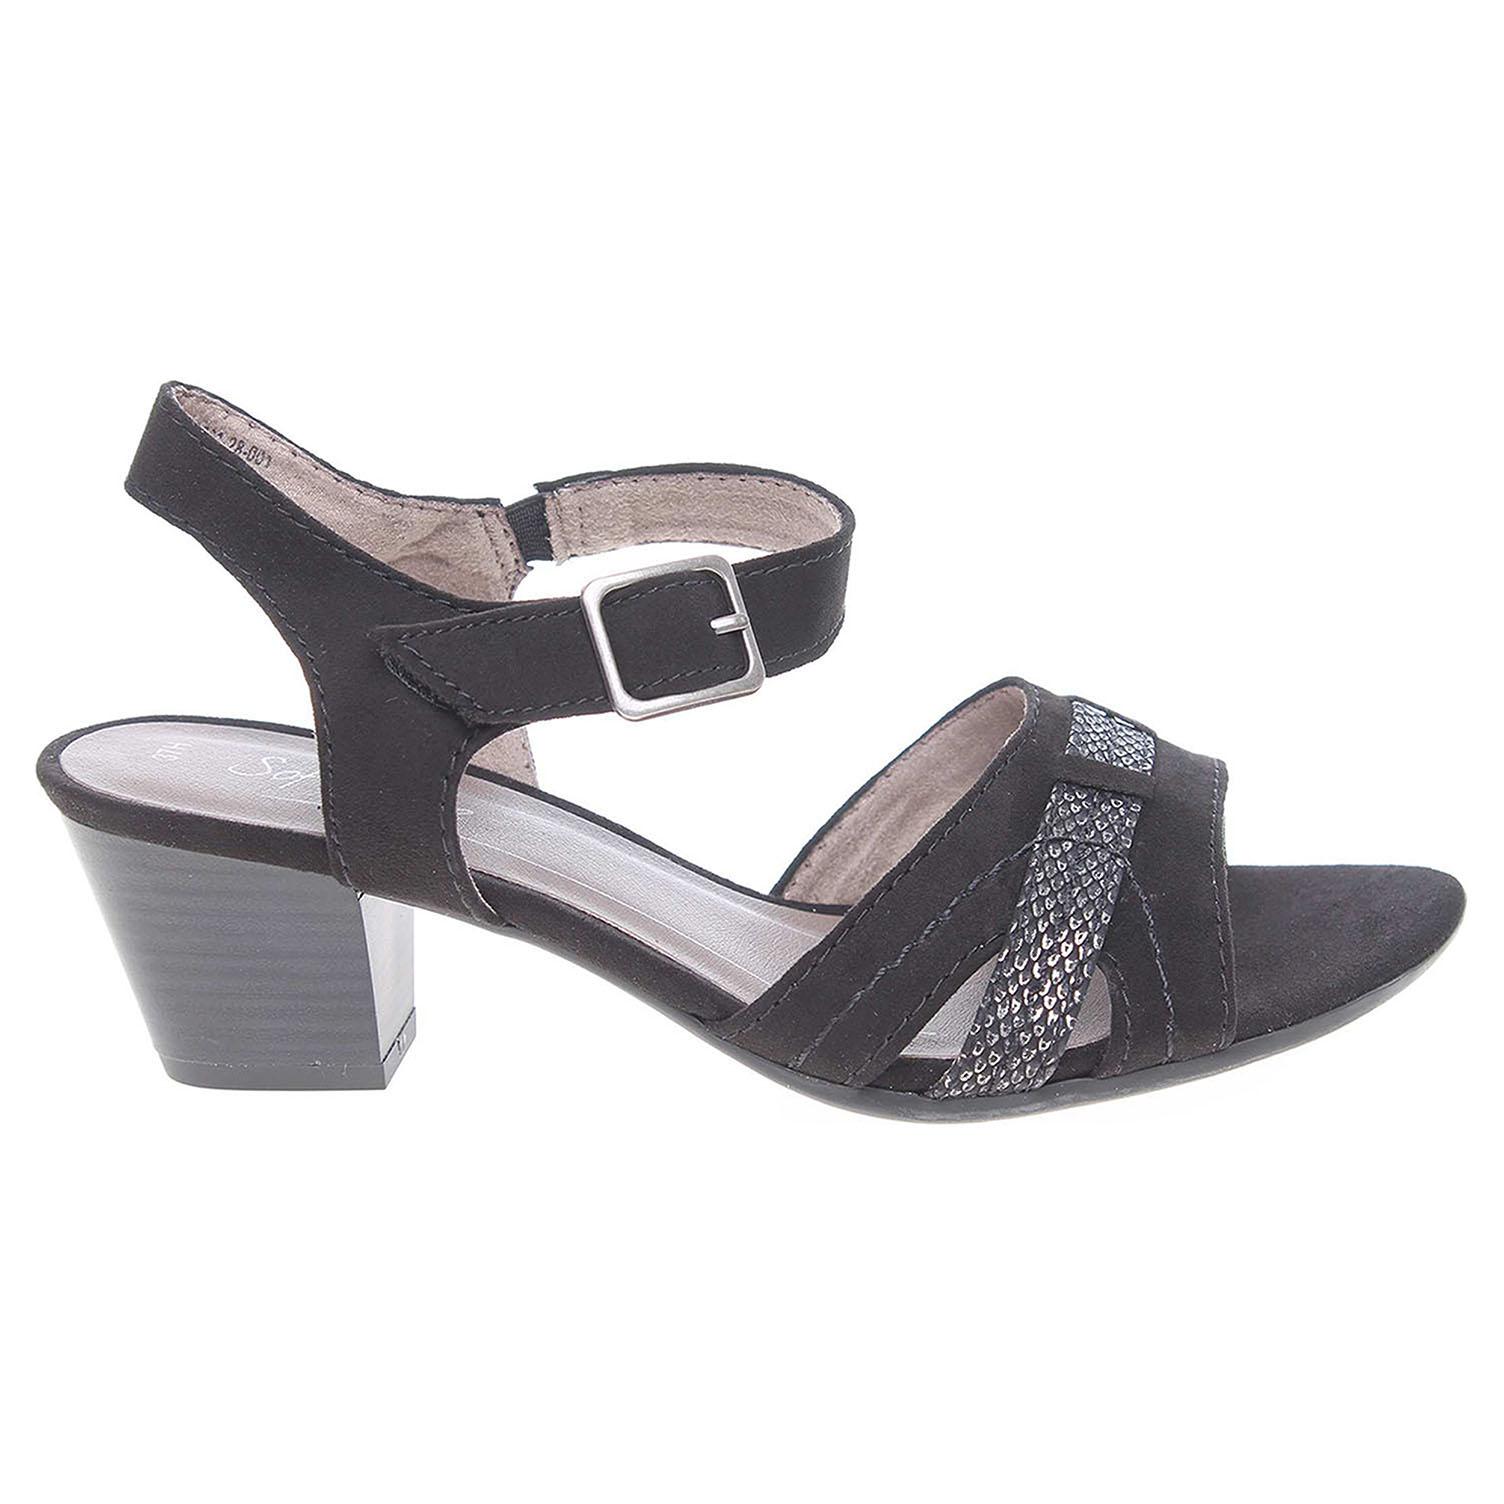 Ecco Jana dámská obuv 8-28361-28 černá 22800355